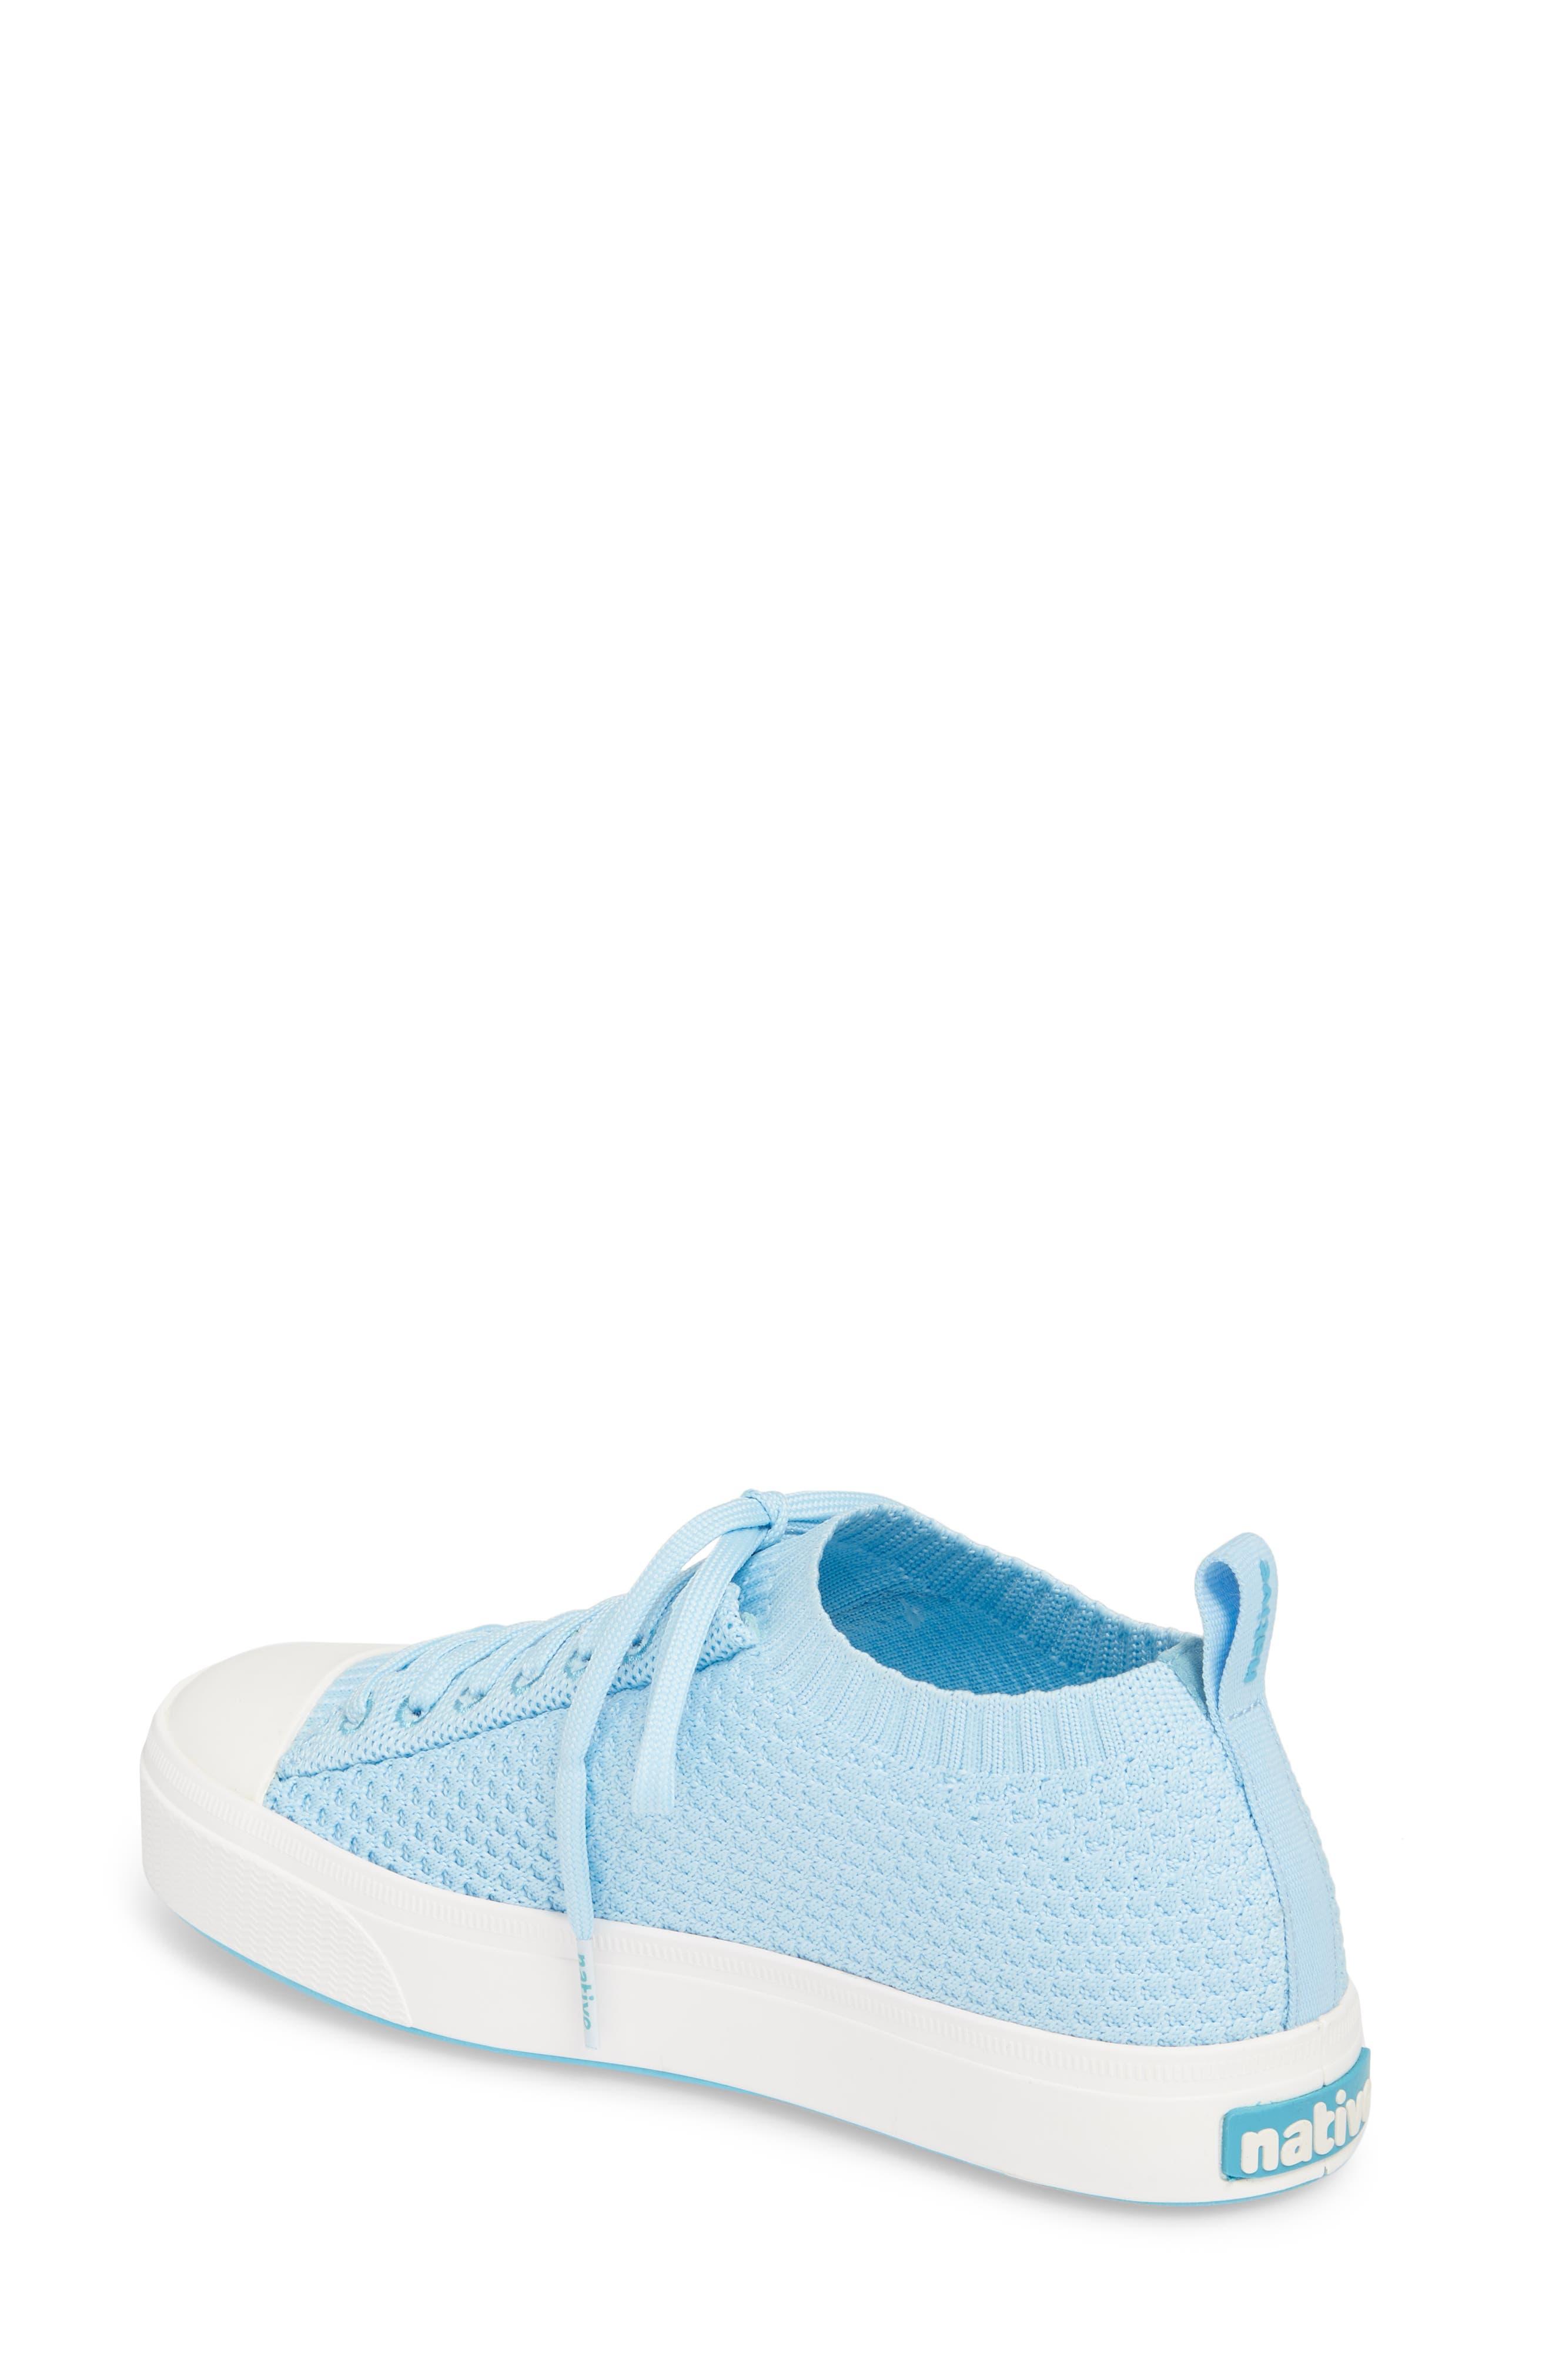 Jefferson 2.0 Liteknit Sneaker,                             Alternate thumbnail 2, color,                             Sky Blue/ Shell White